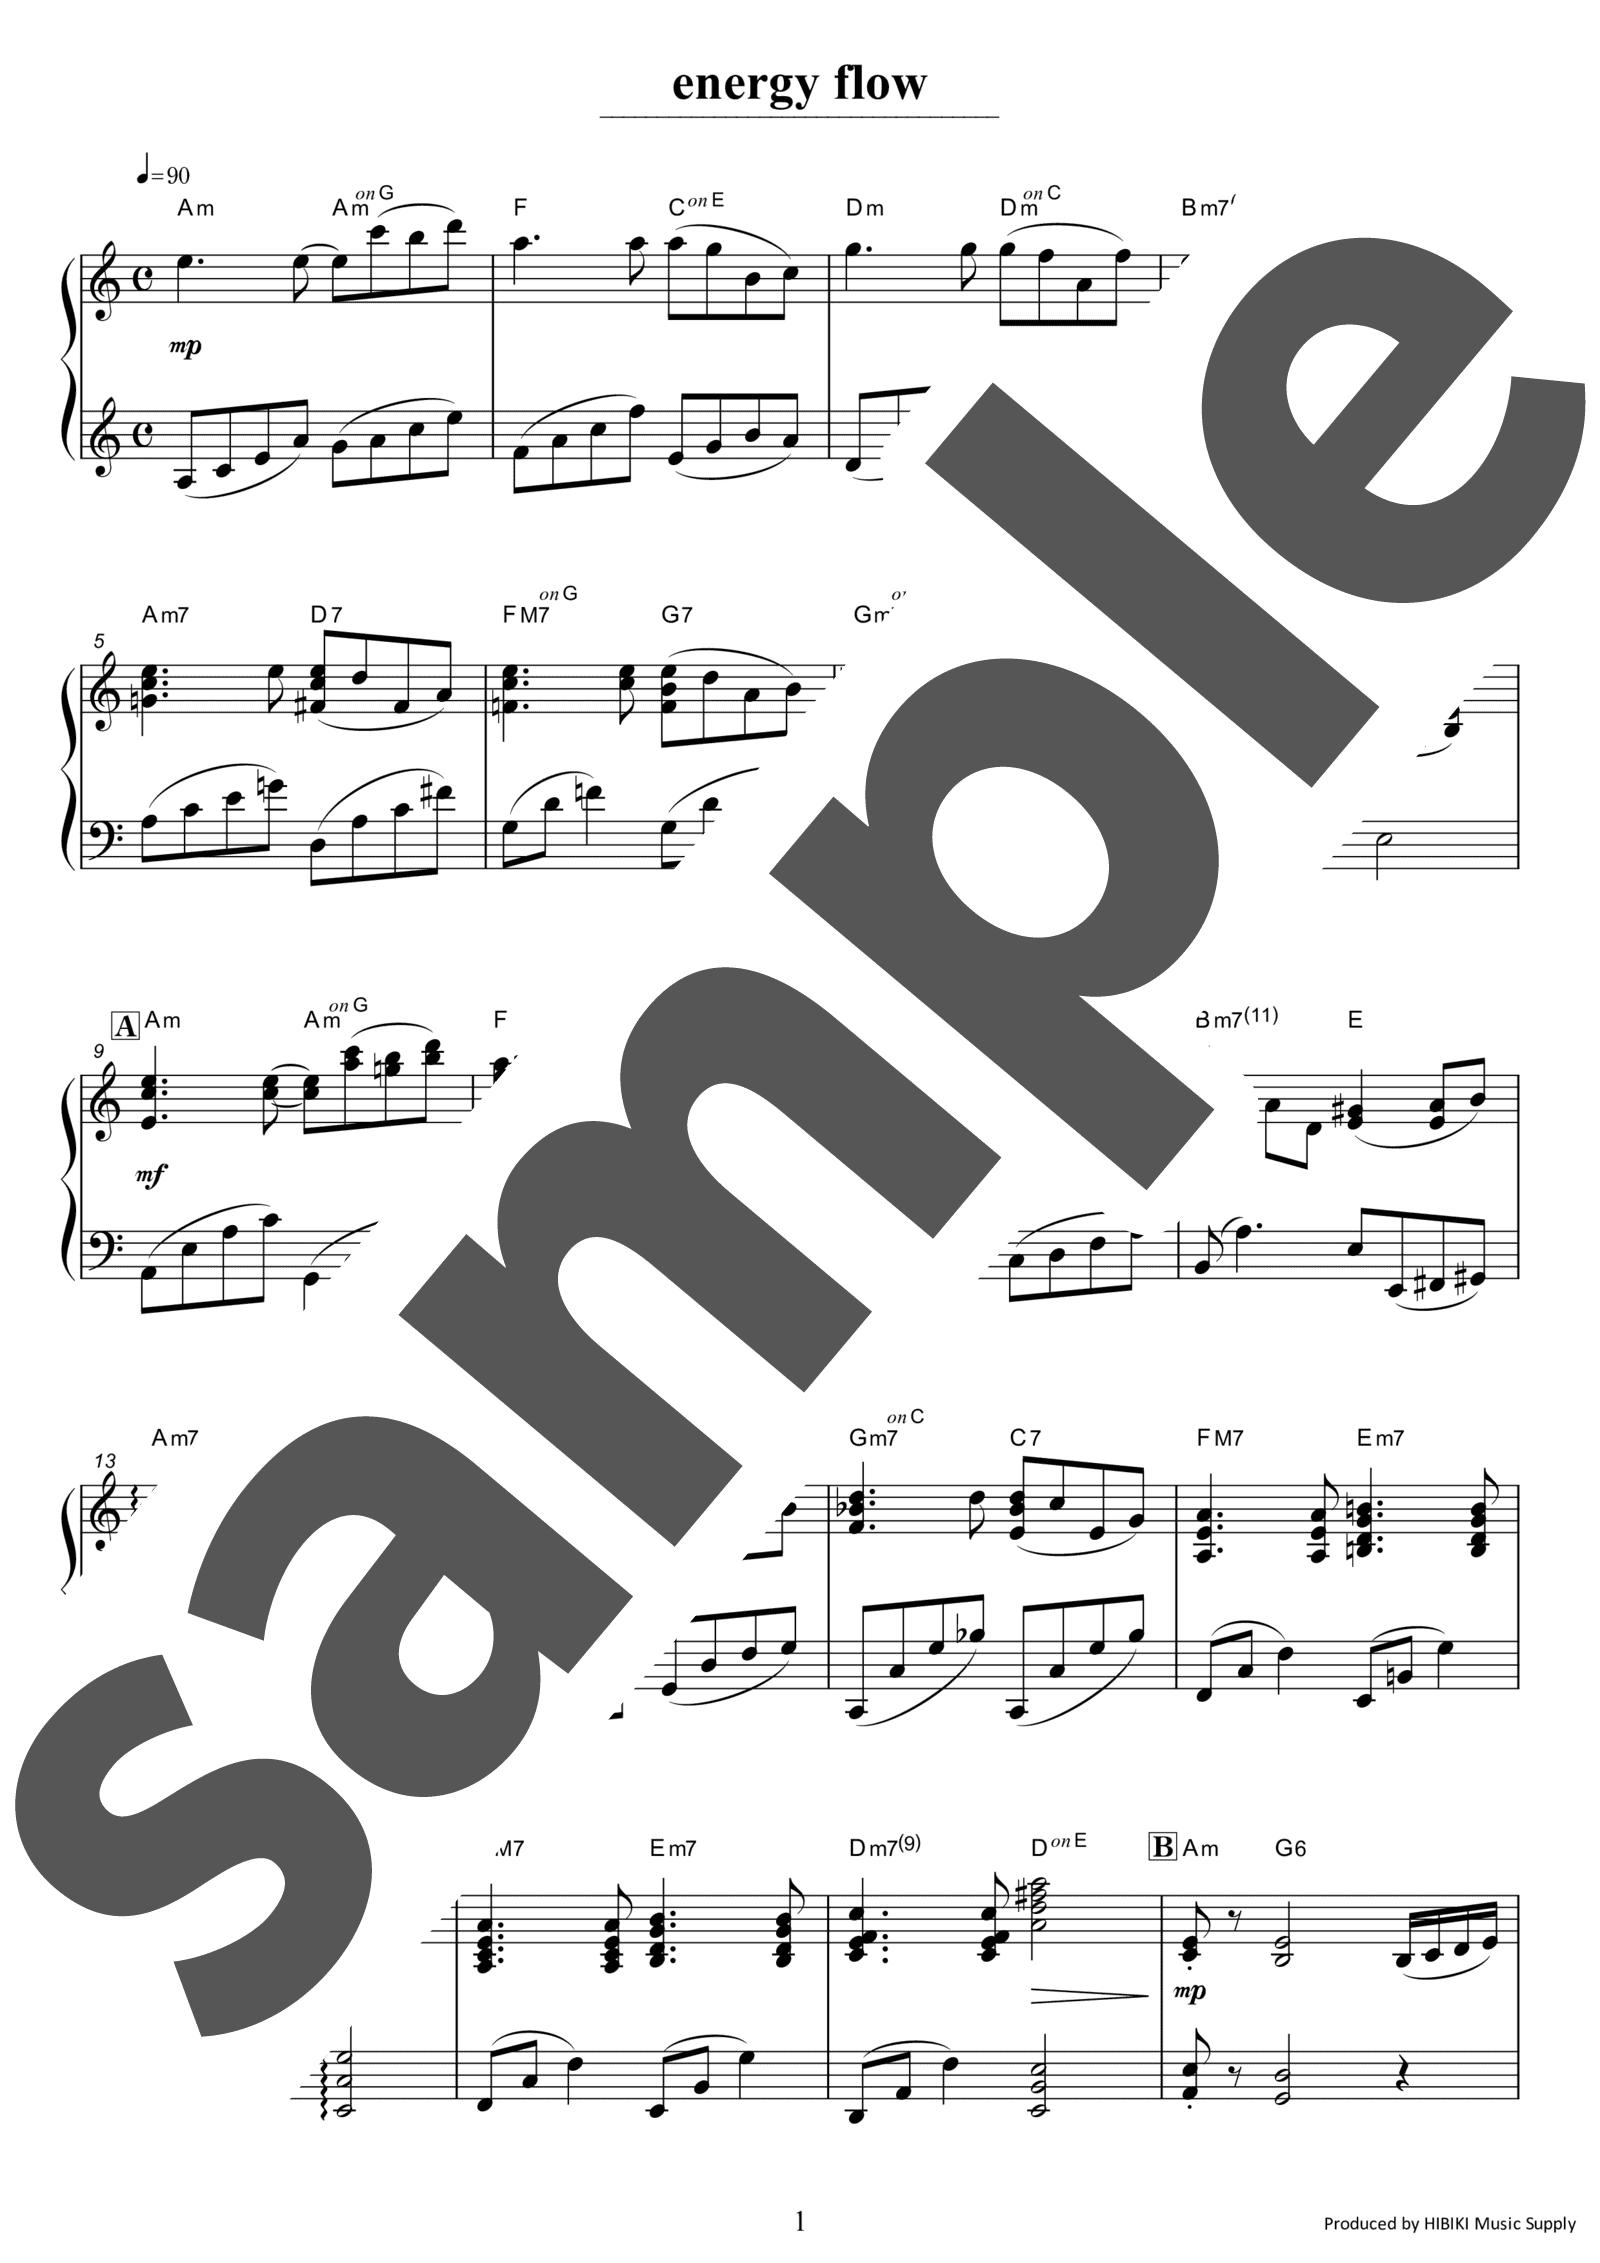 「energy flow」のサンプル楽譜